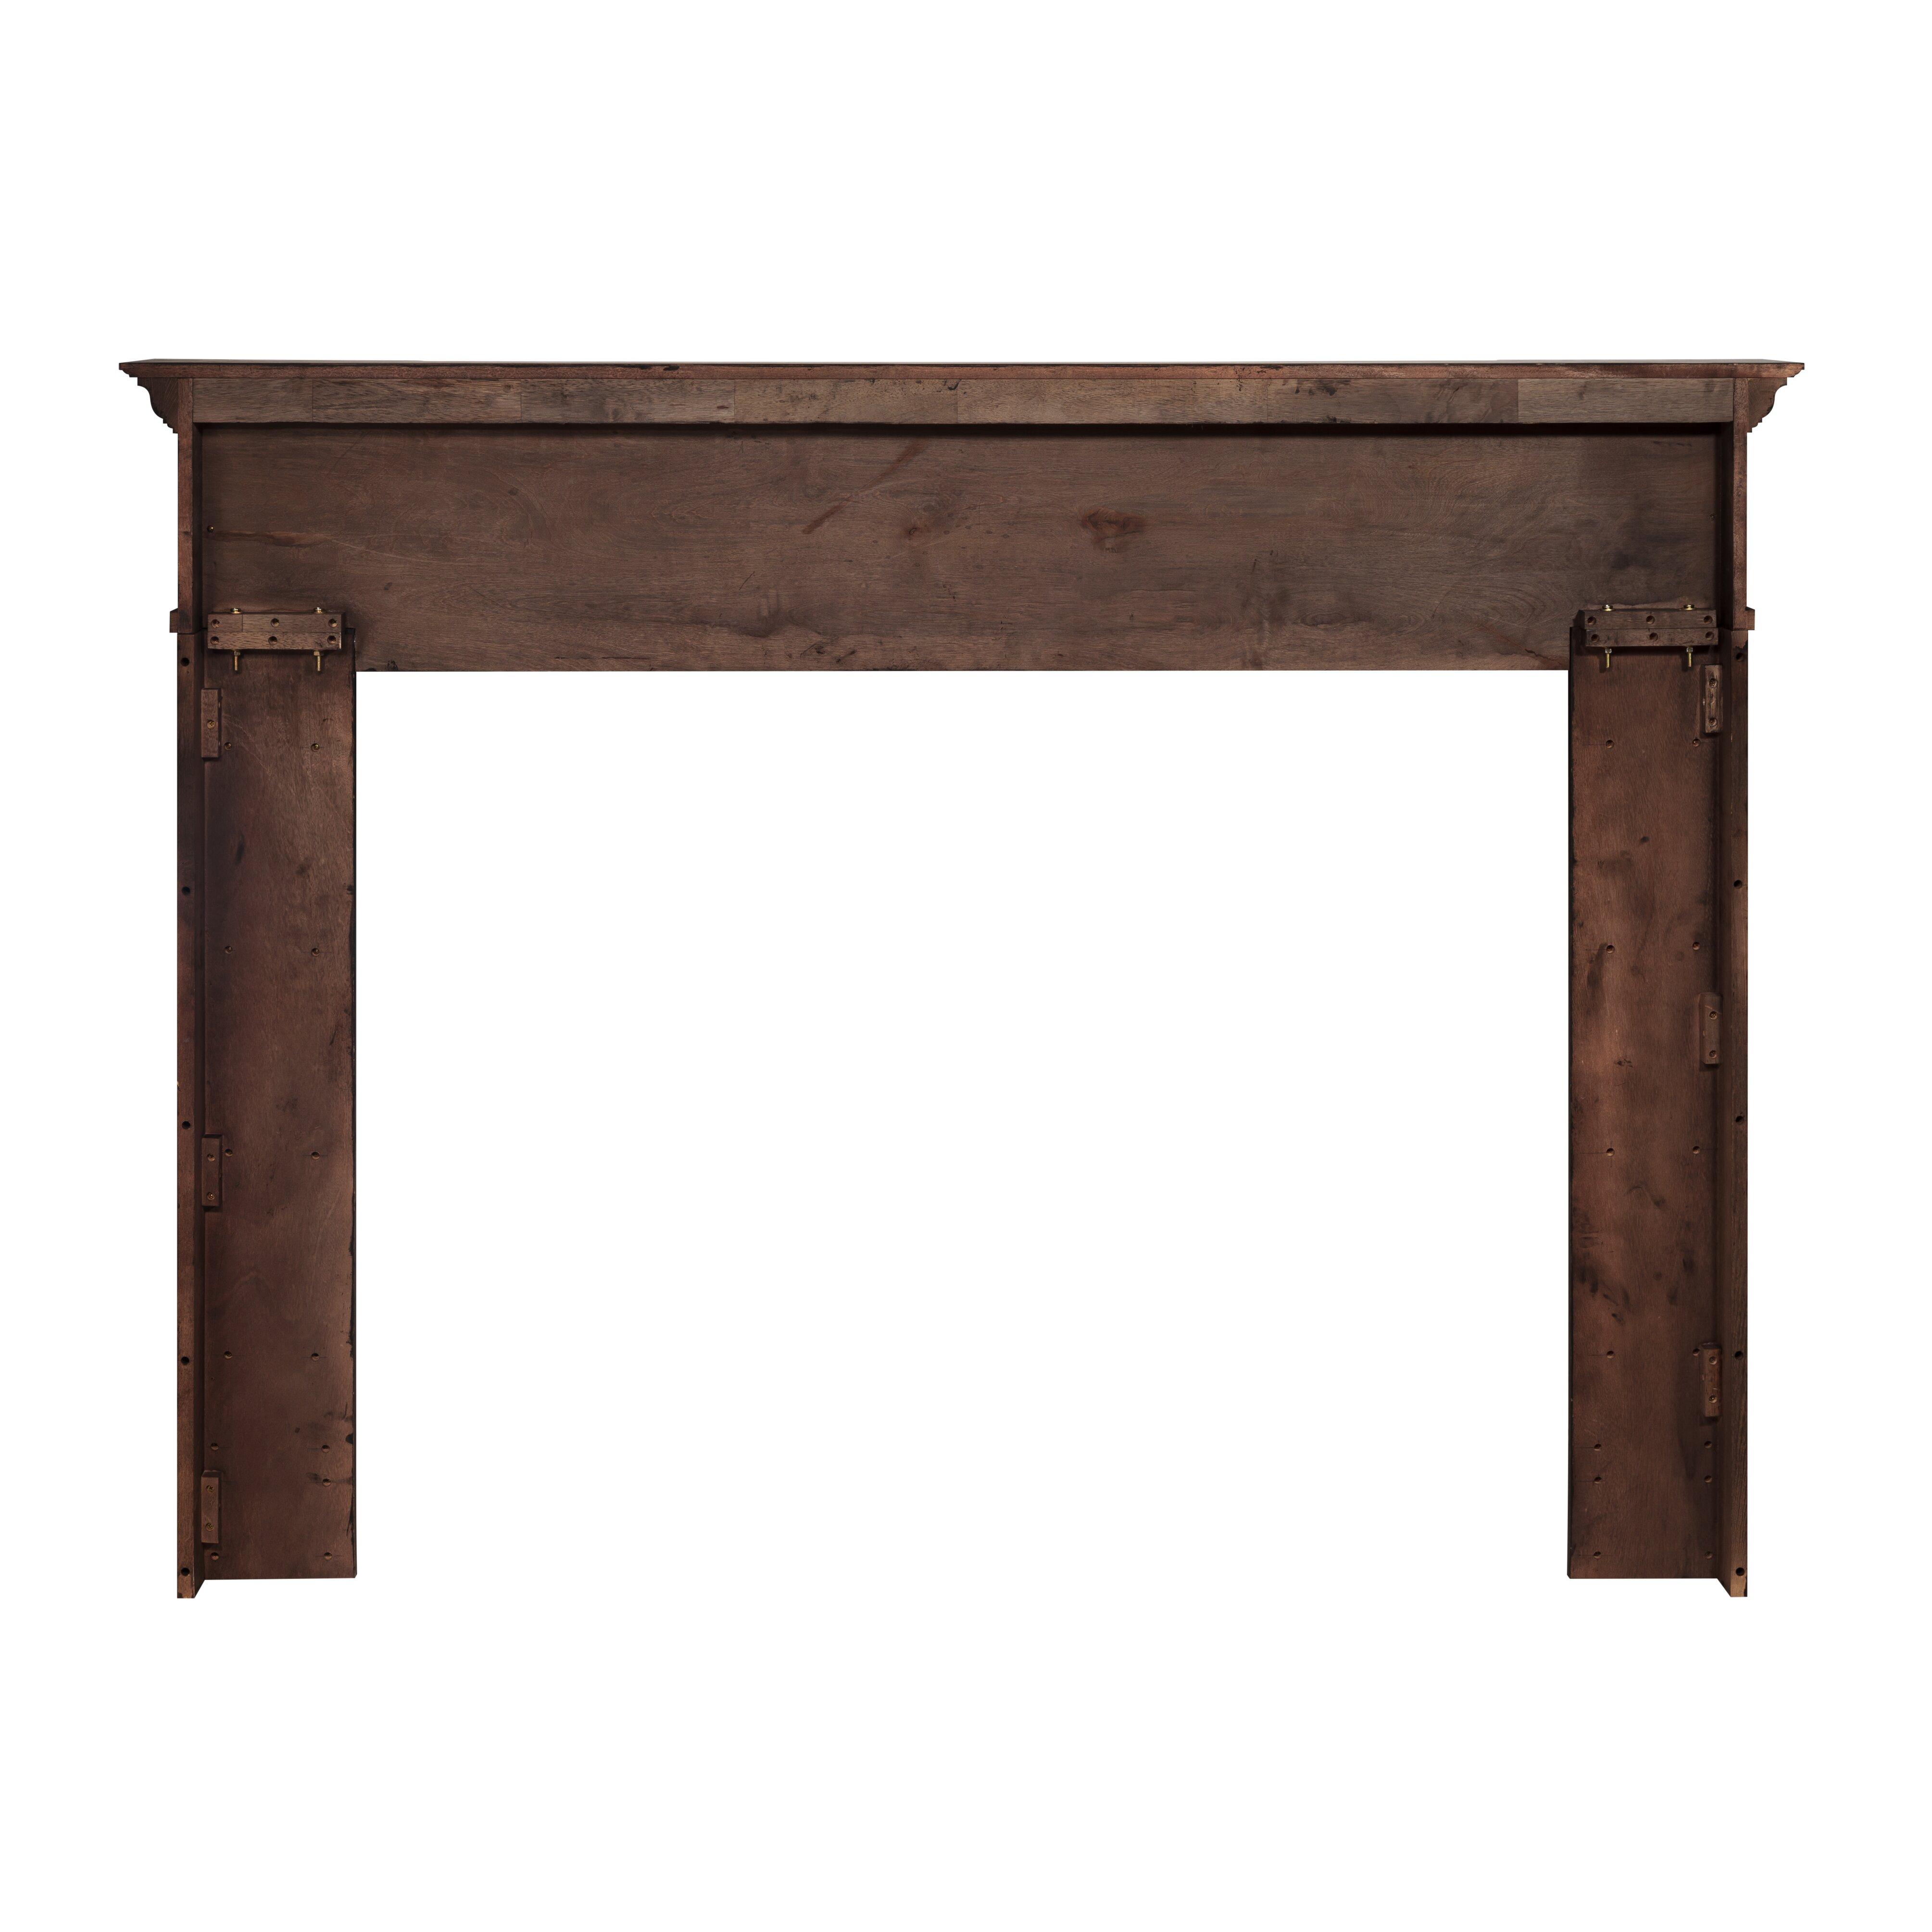 Pearl mantels avondale fireplace mantel surround reviews wayfair - Mantelpiece surround ...